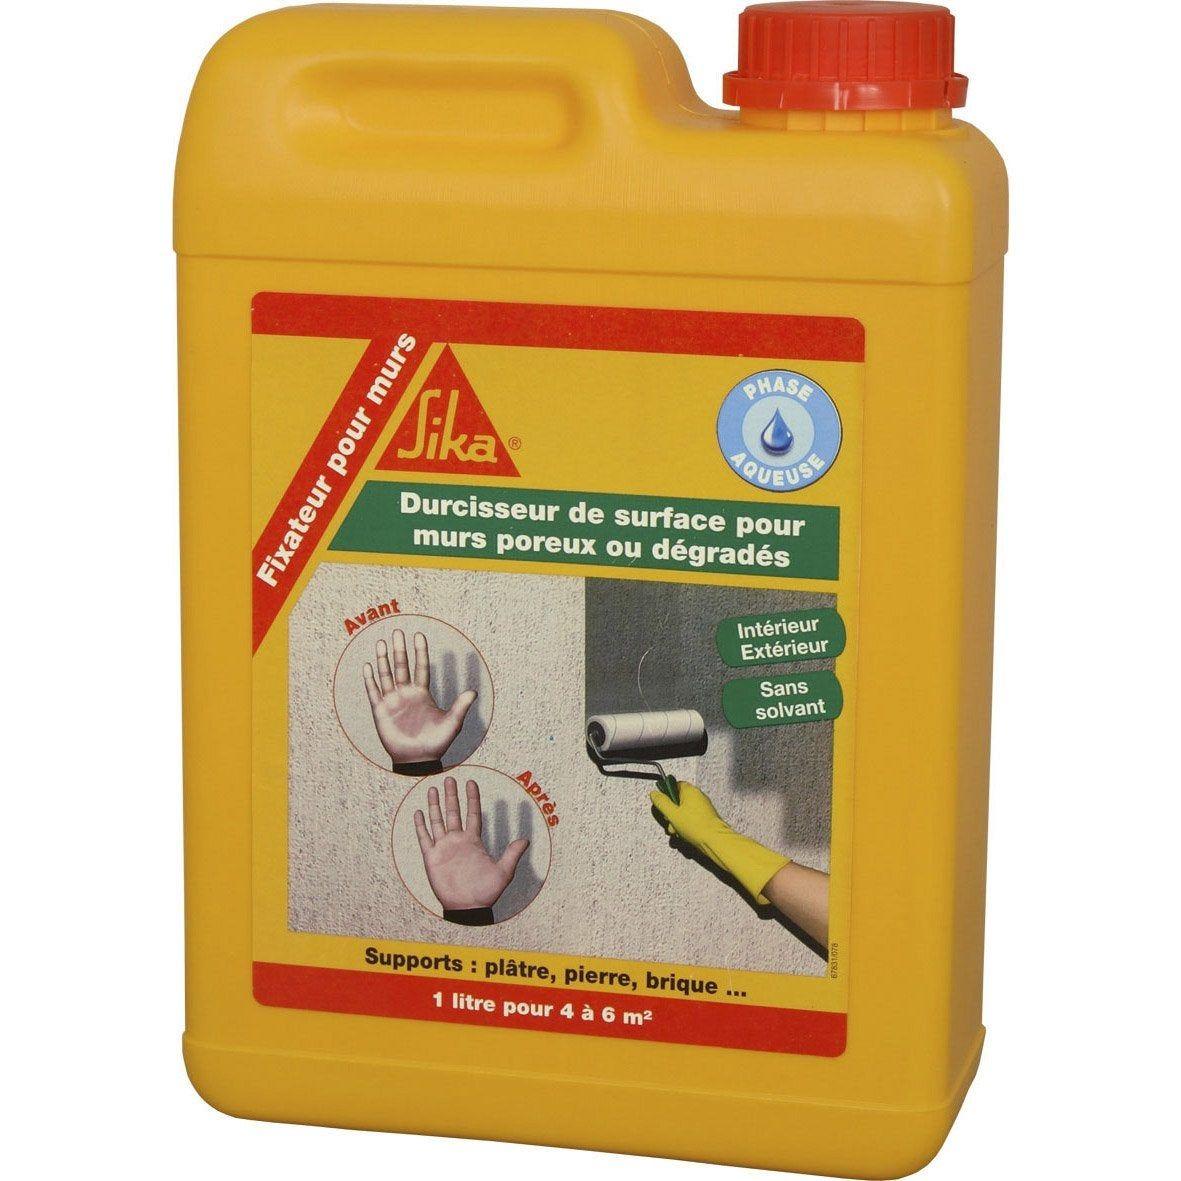 Resine Protectrice Sika Impermur 2 L Incolore Resine Castorama